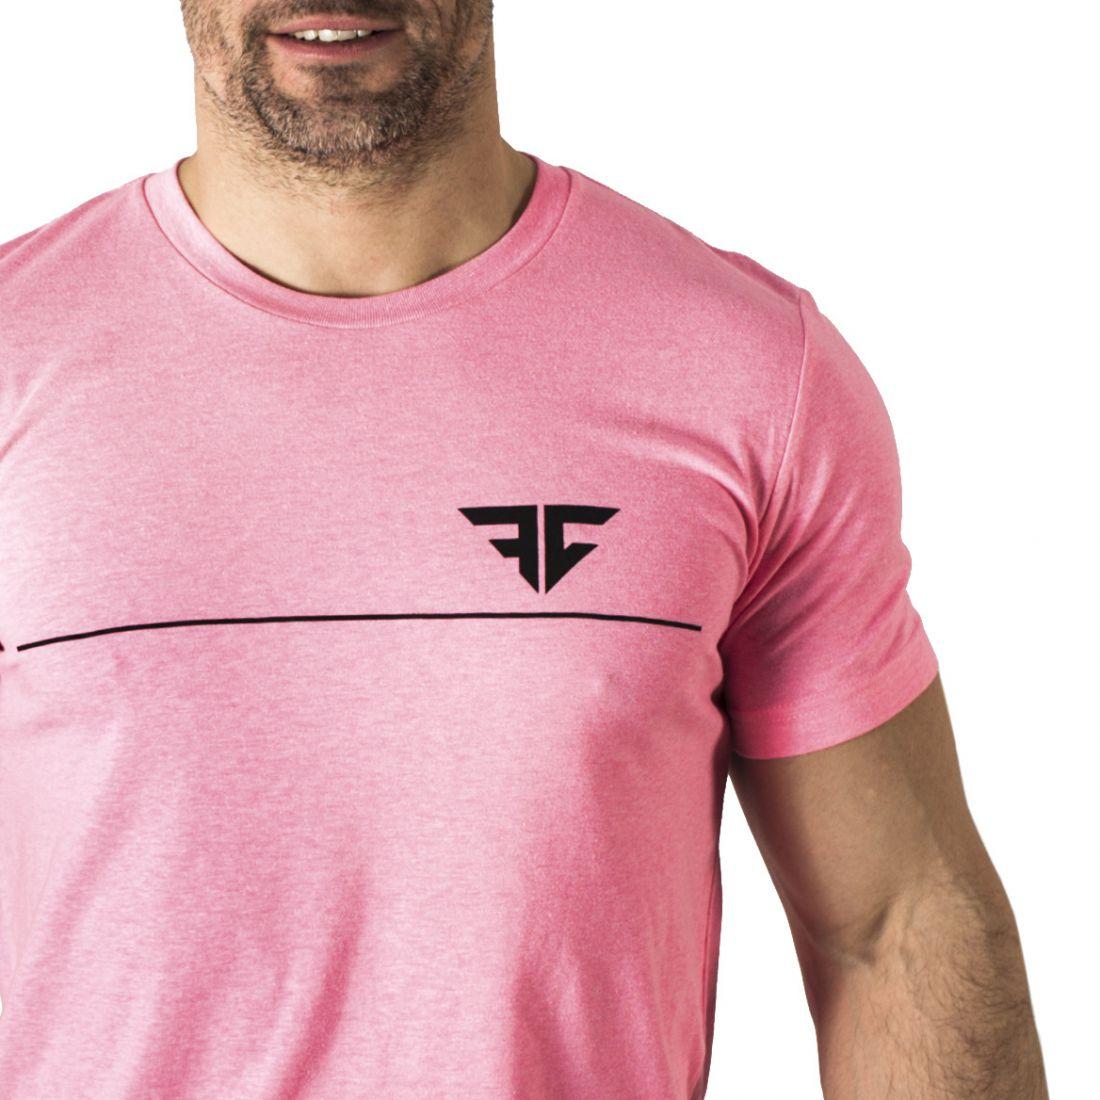 b931b5ca00199 Mens Neon Pink T Shirt - DREAMWORKS